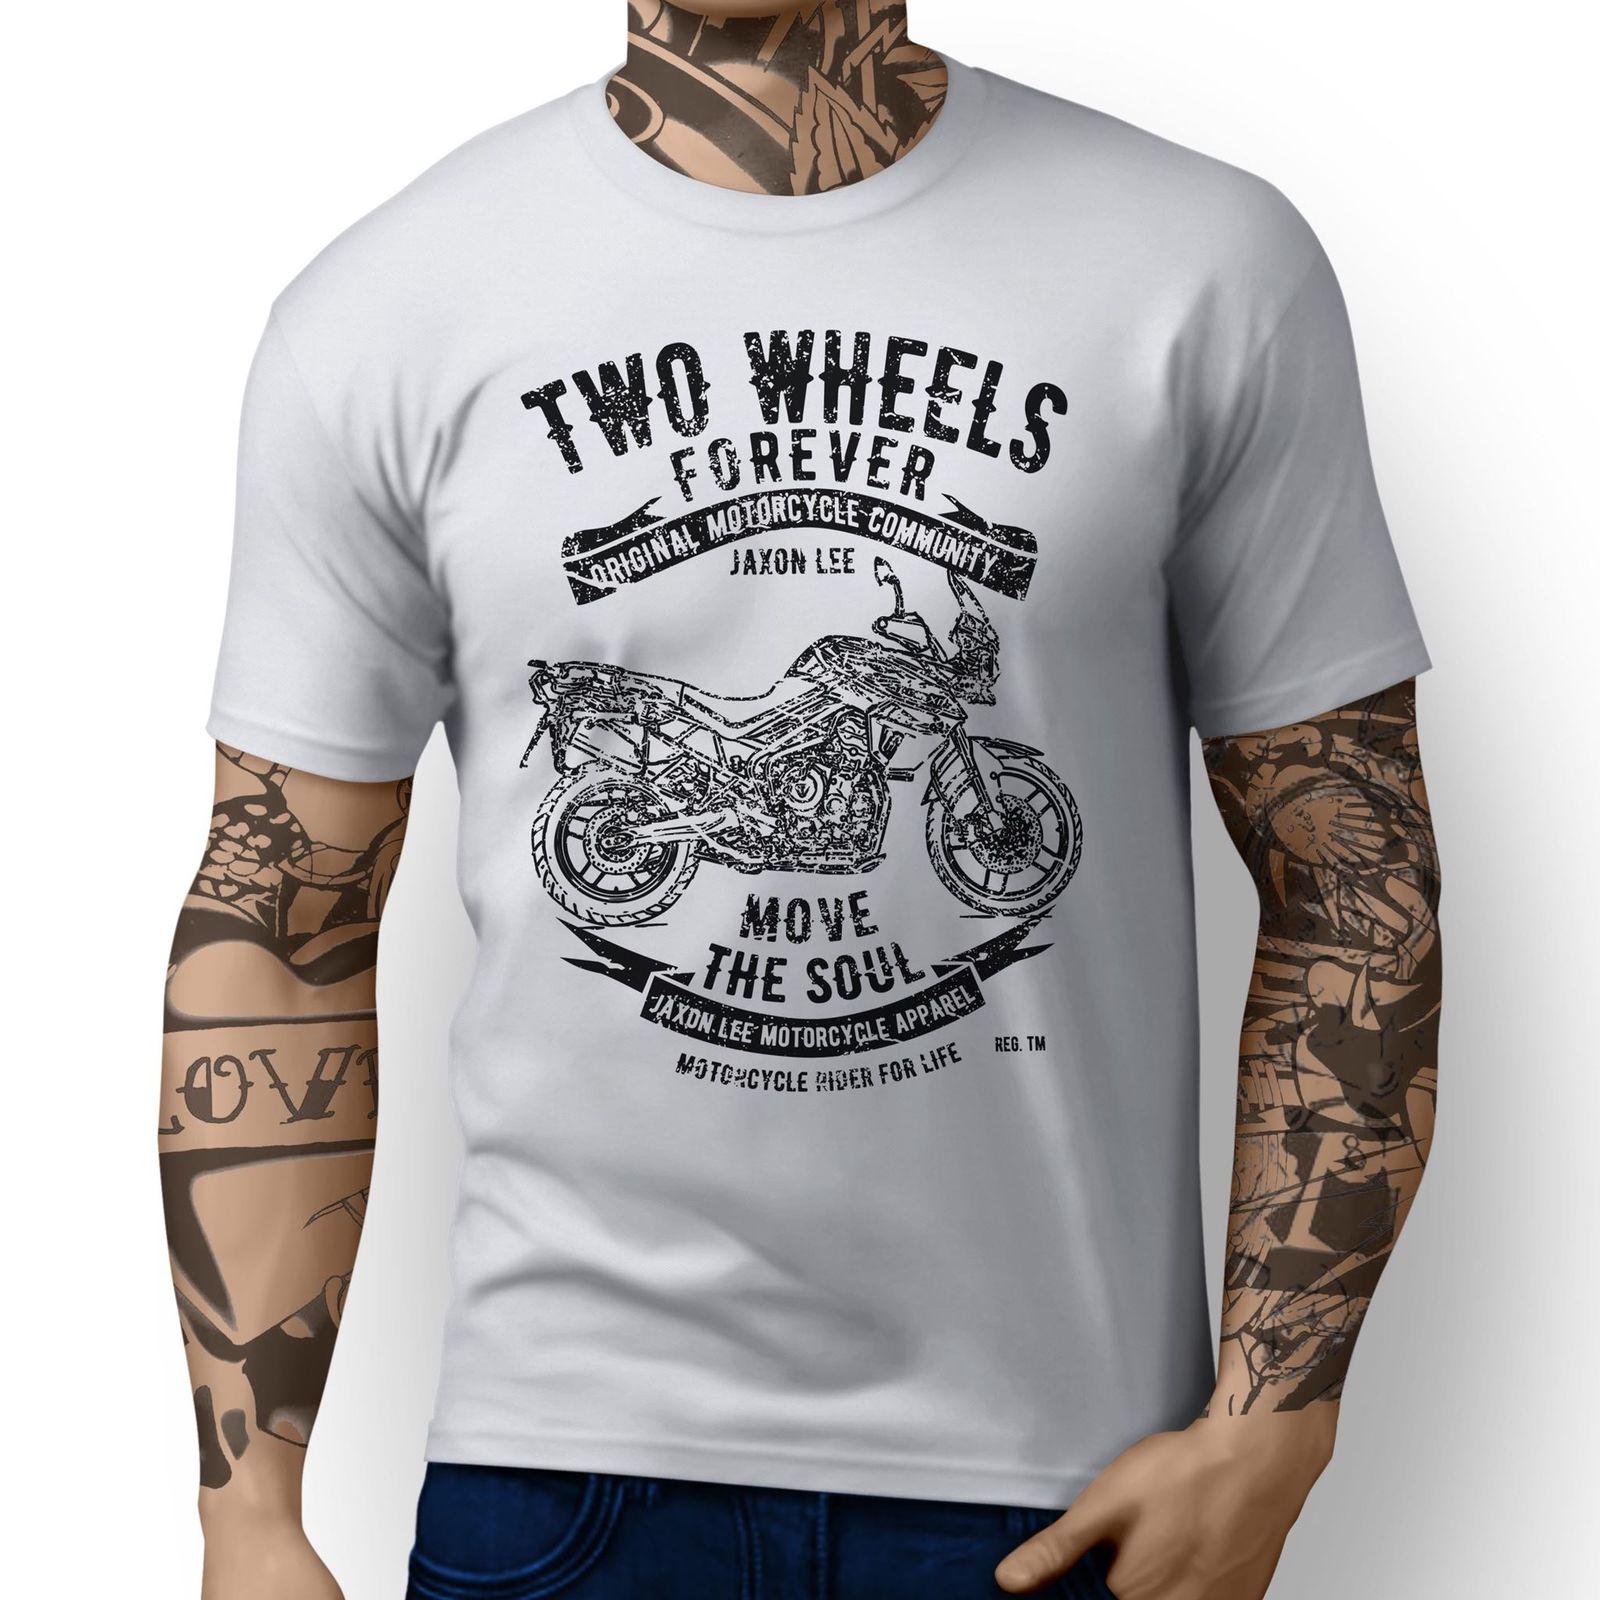 Sale American Motor Tiger 800 XRT Motorcycle Tee shirt